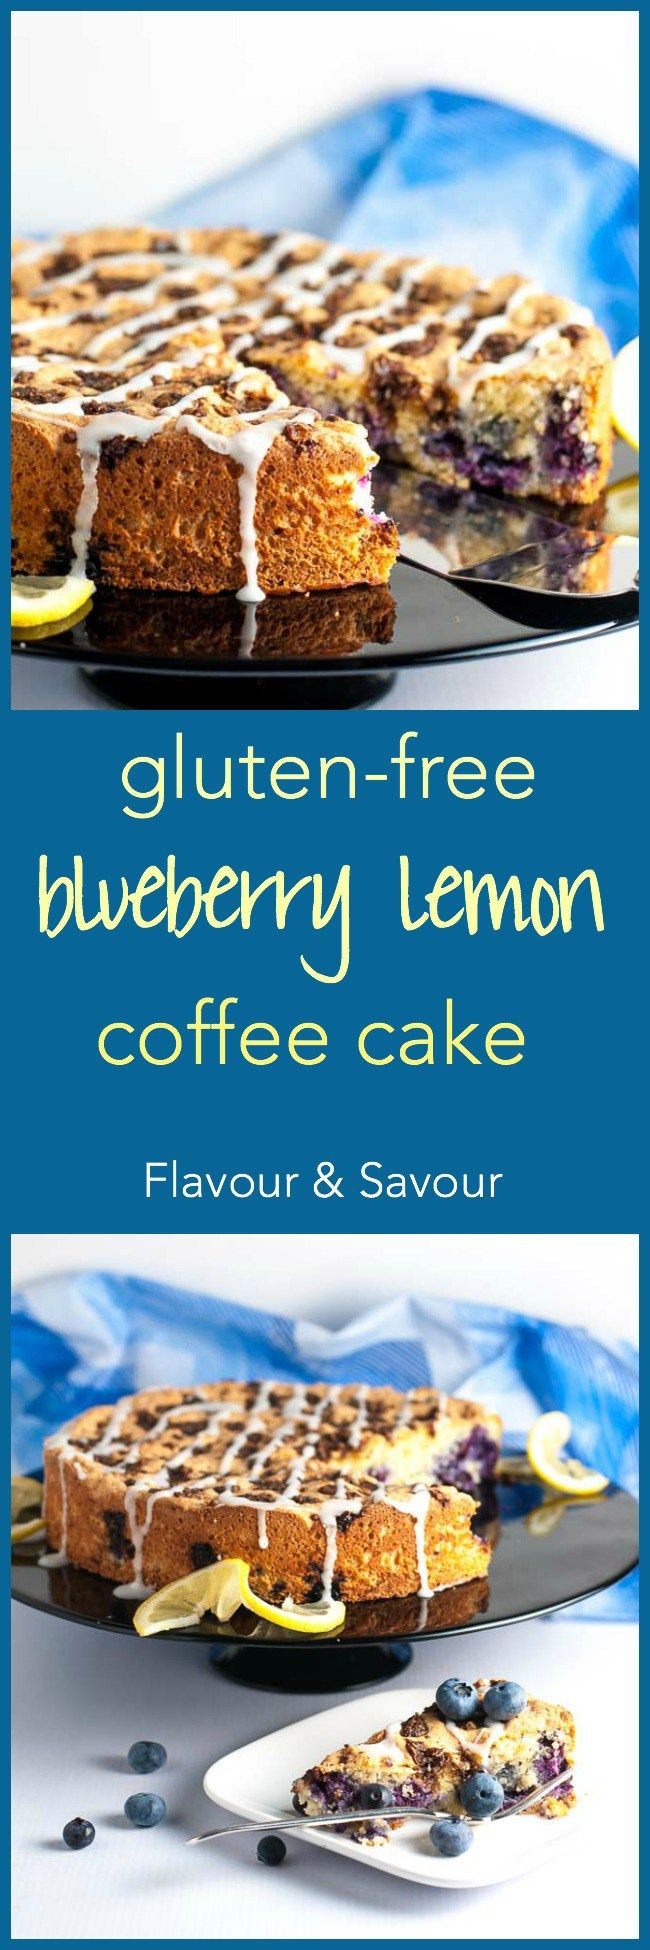 Gluten-Free Blueberry Lemon Coffee Cake   Recipe (With images)   Blueberry lemon coffee cake ...